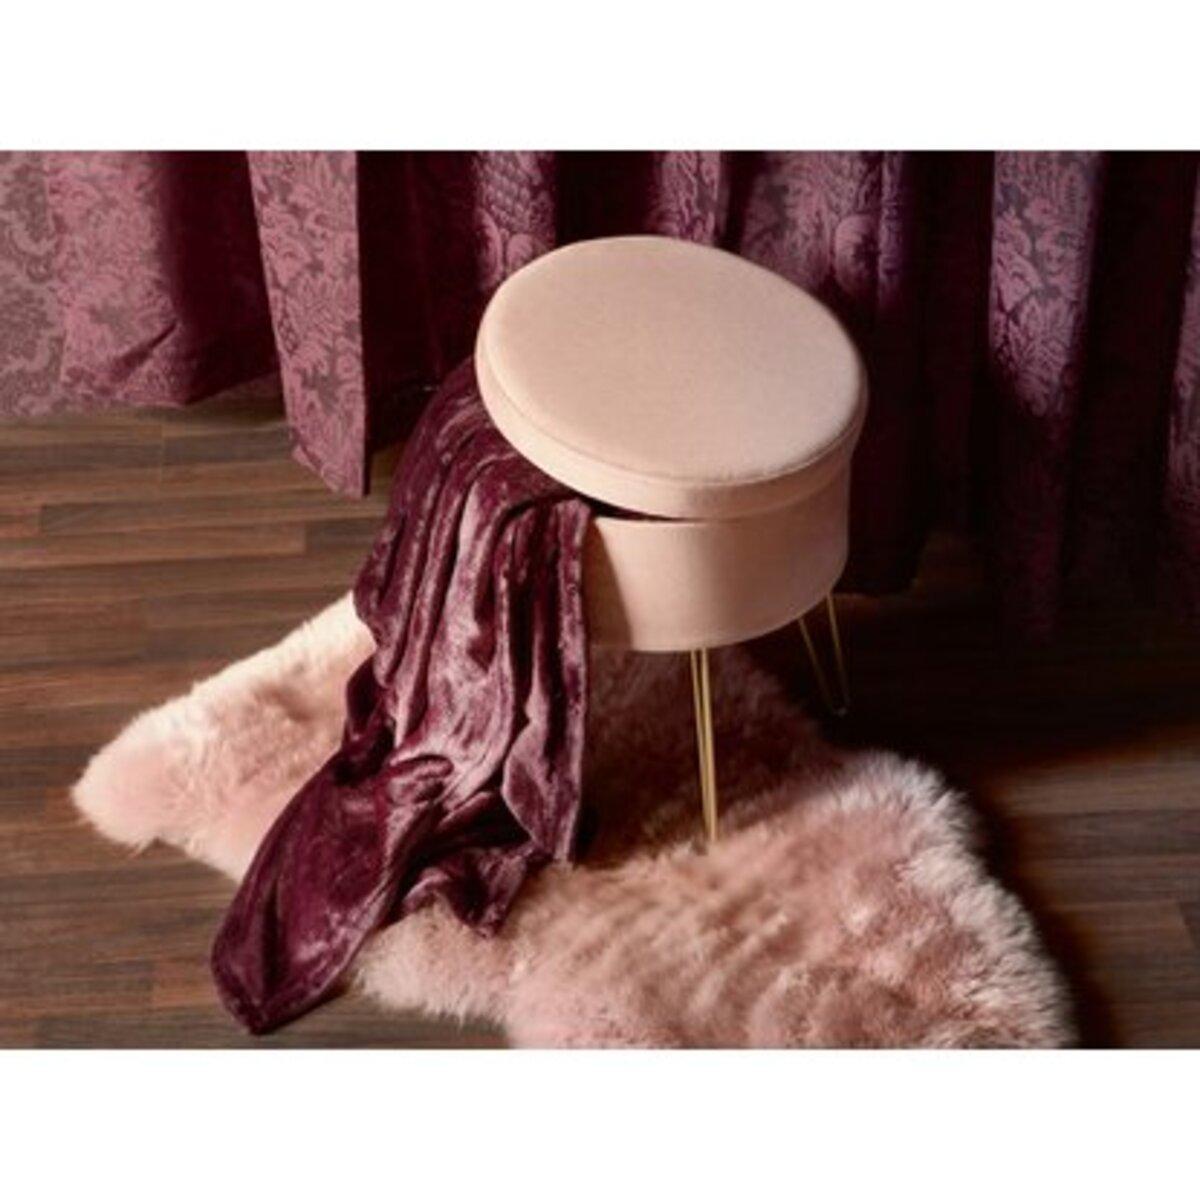 Bild 4 von Sitzhocker Blush Bordeaux MDF 45 cm x Ø 36 cm Rosa